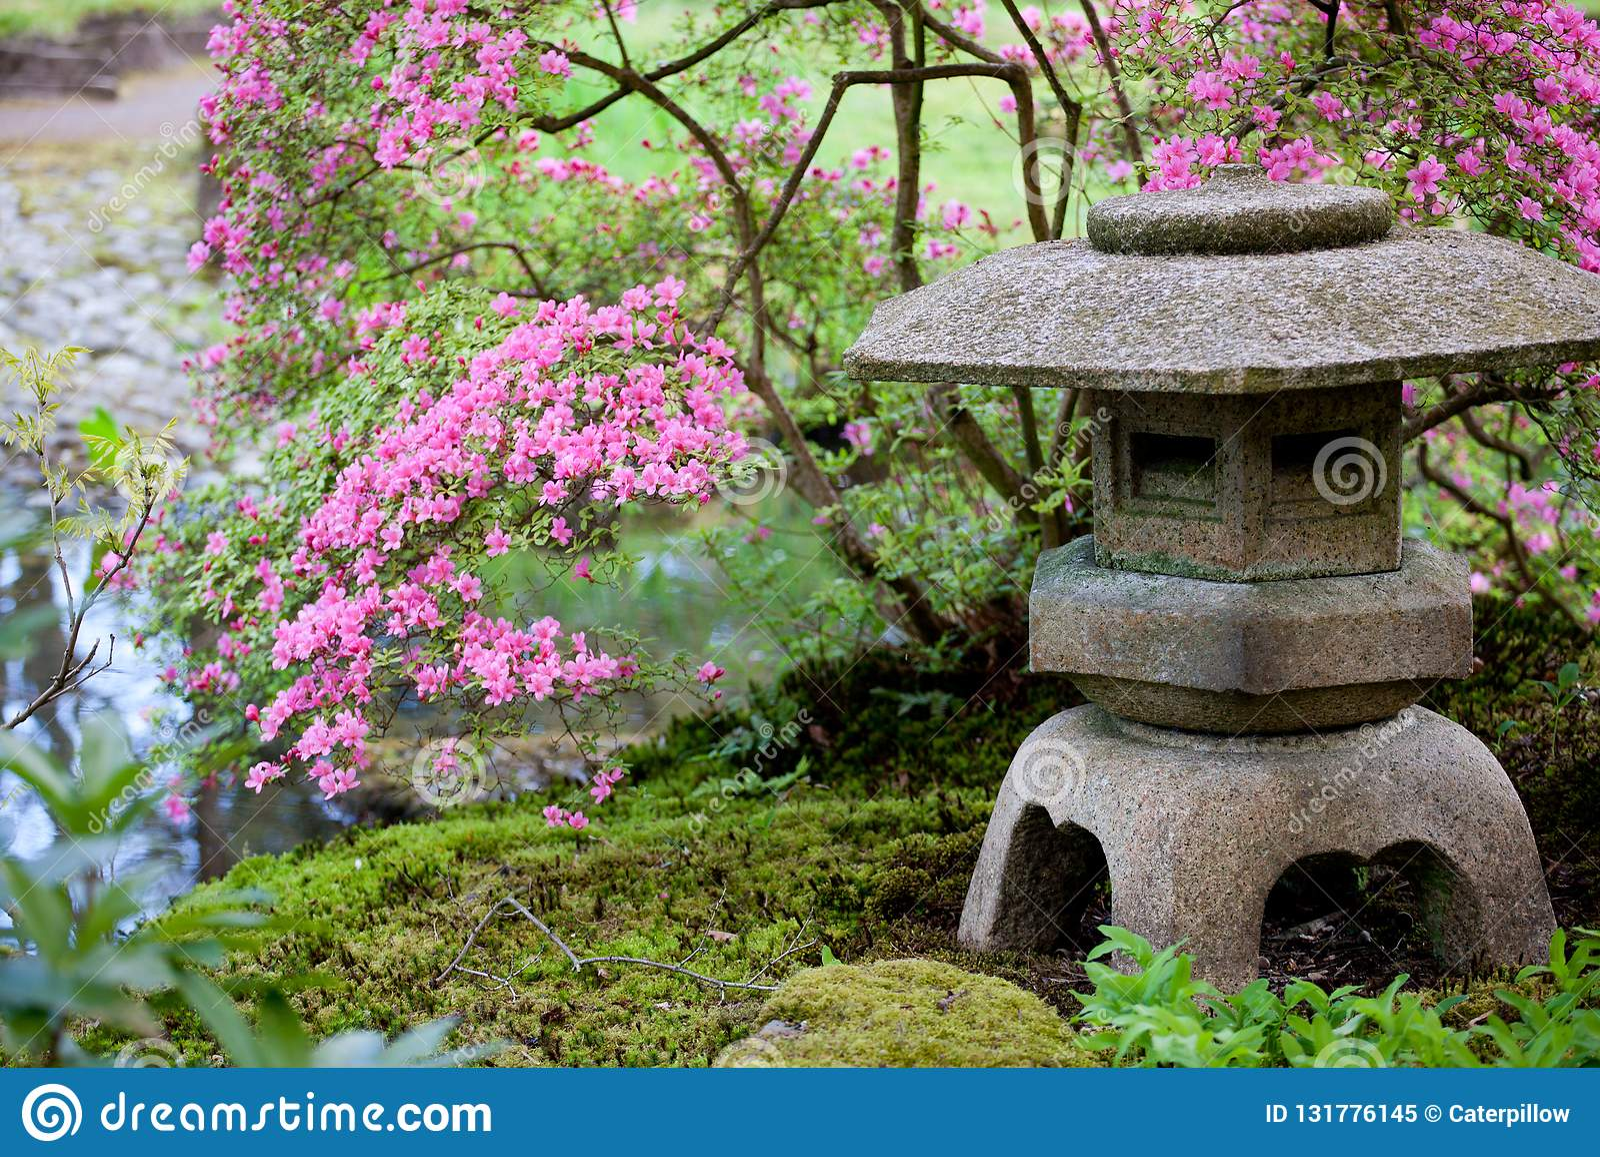 Stone Japanese Lantern In A Traditional Oriental Garden Stock